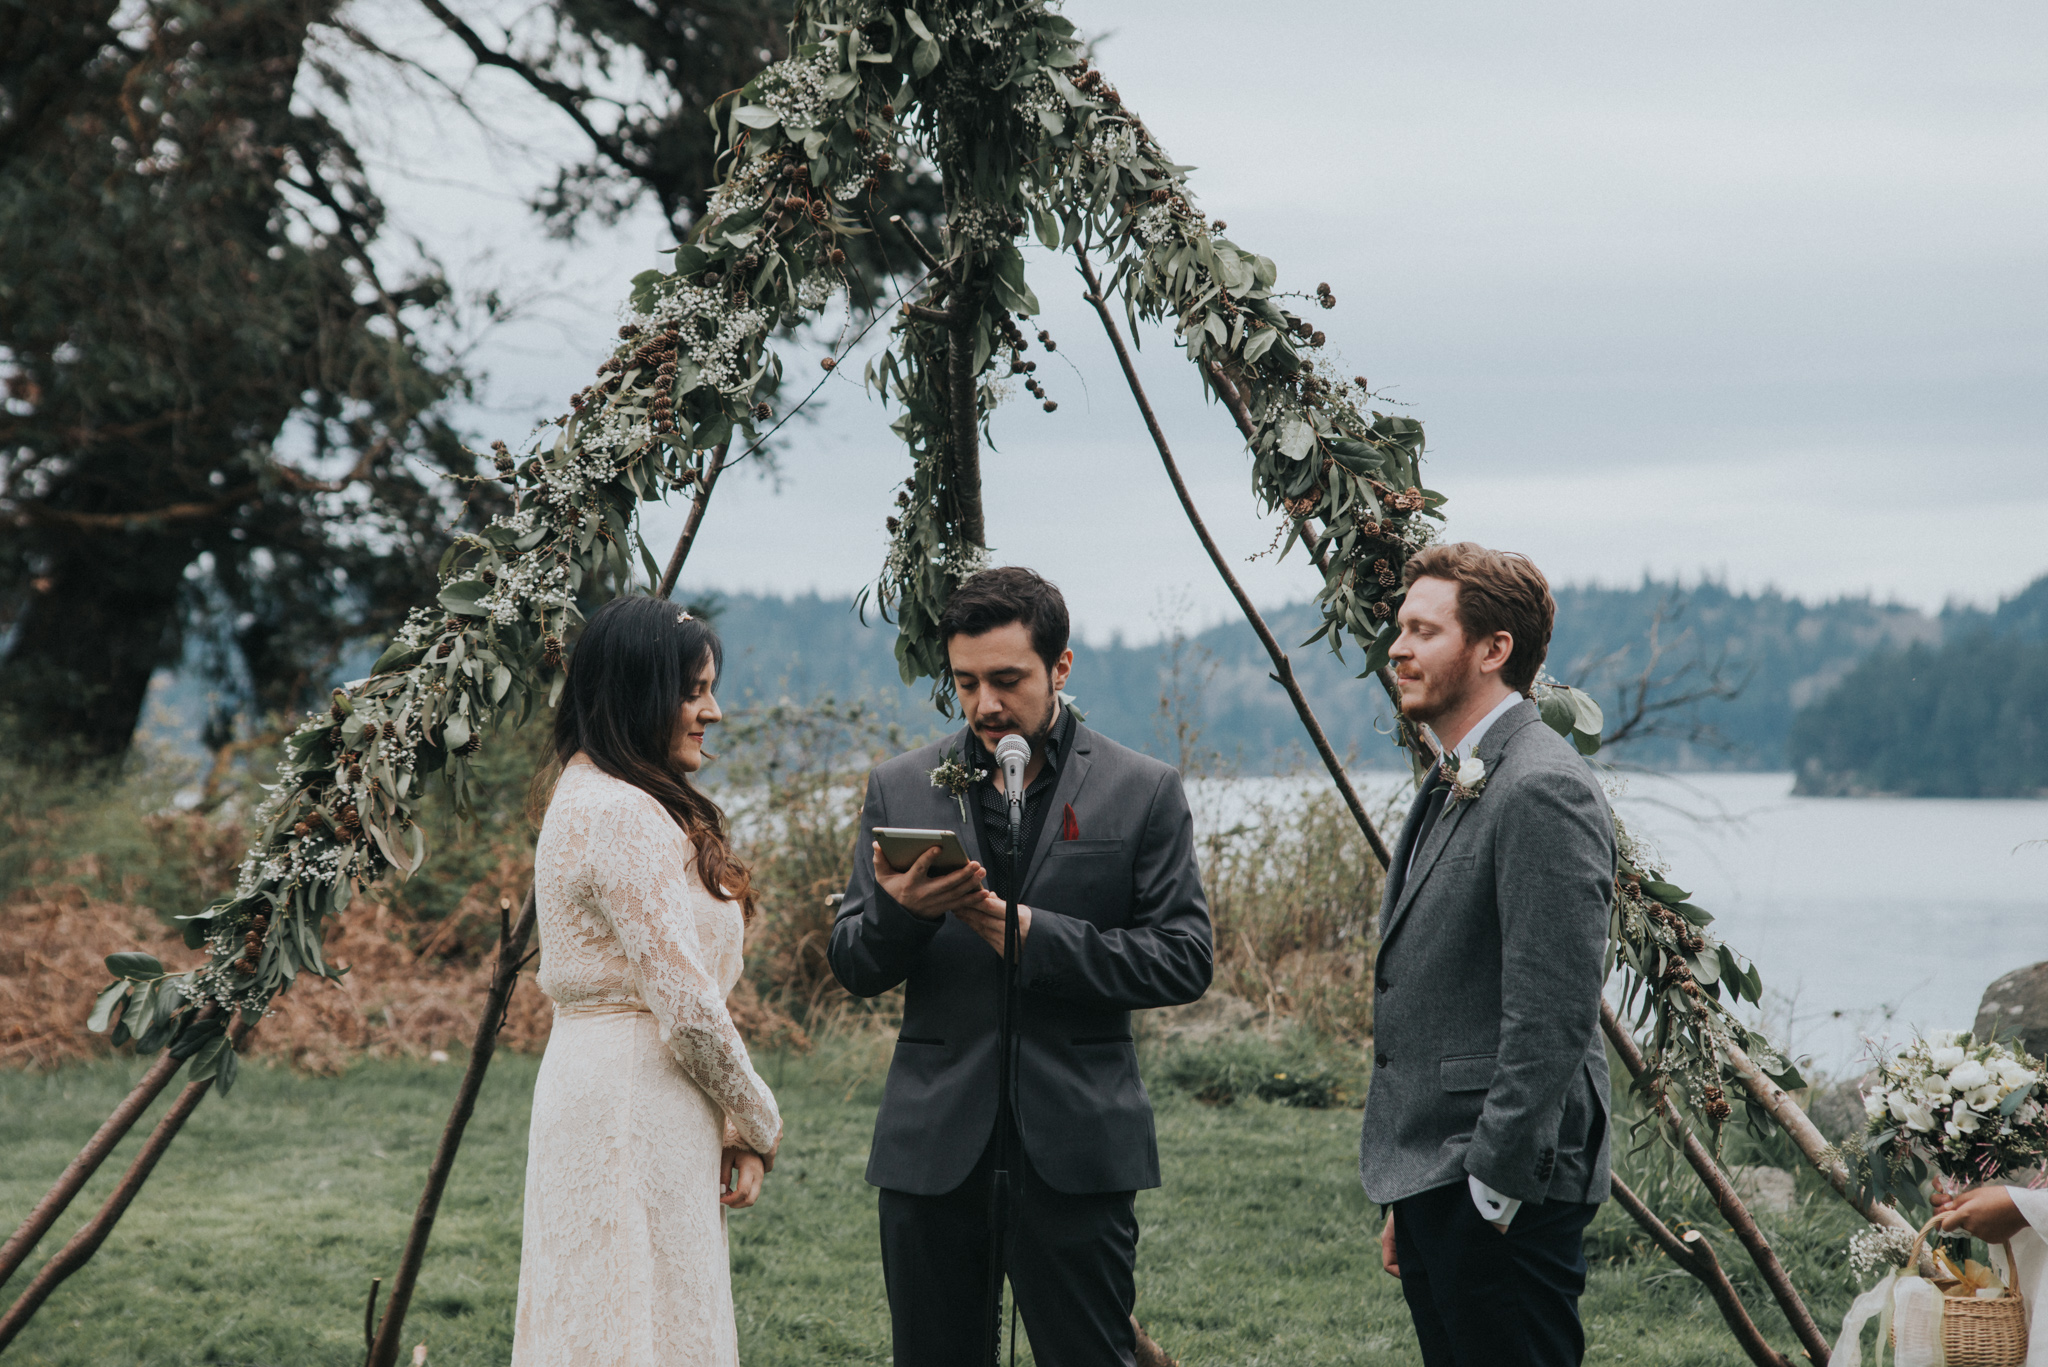 Bellingham wedding Woodstock Farms Vishal Goklani Seattle Wedding Photographer018.JPG